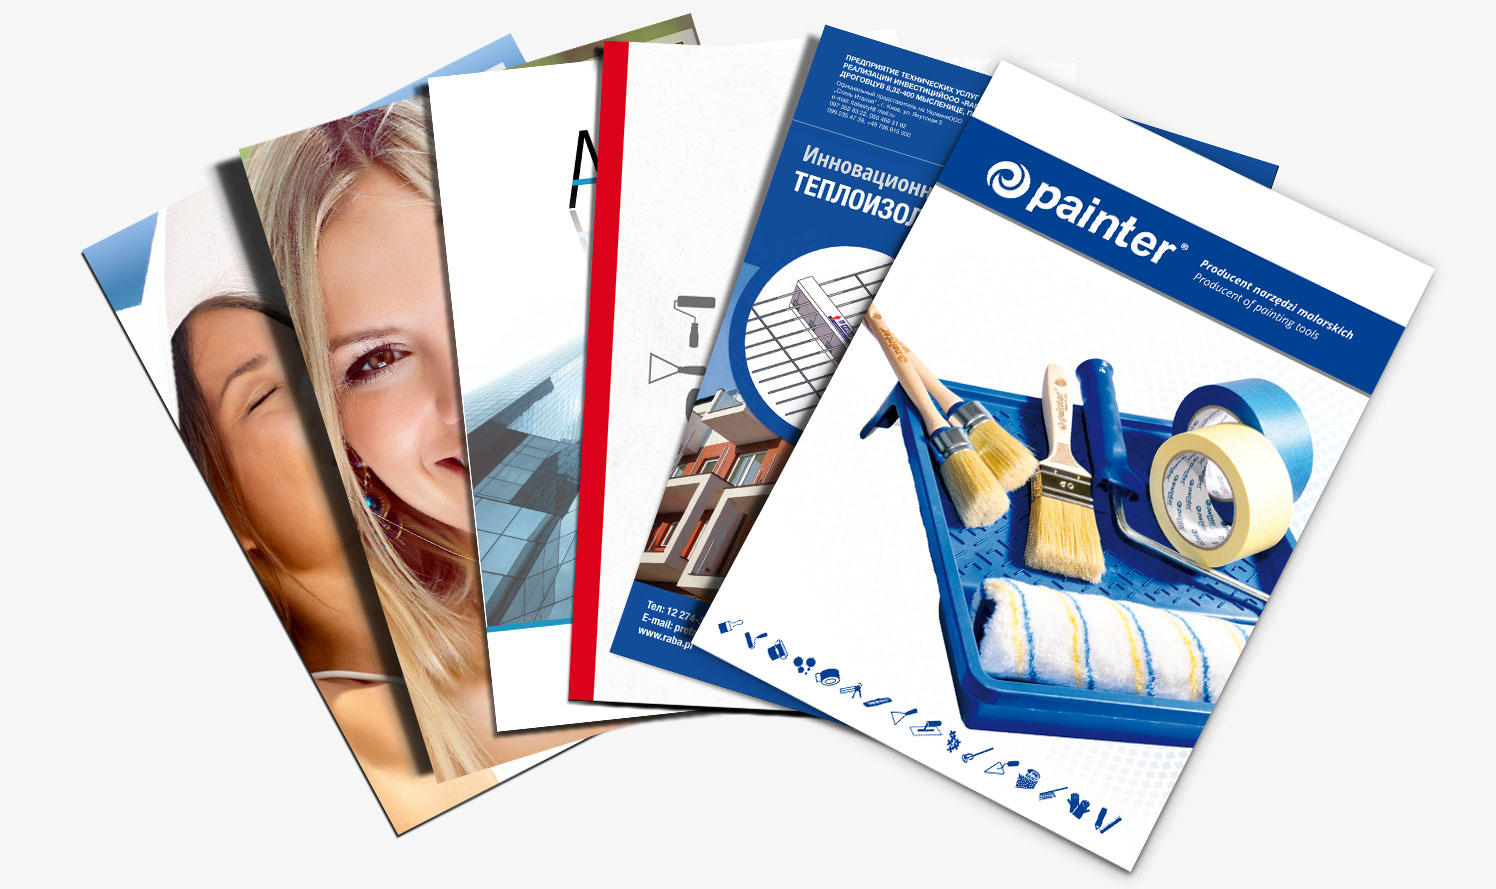 katalogi-produktowe-krakow